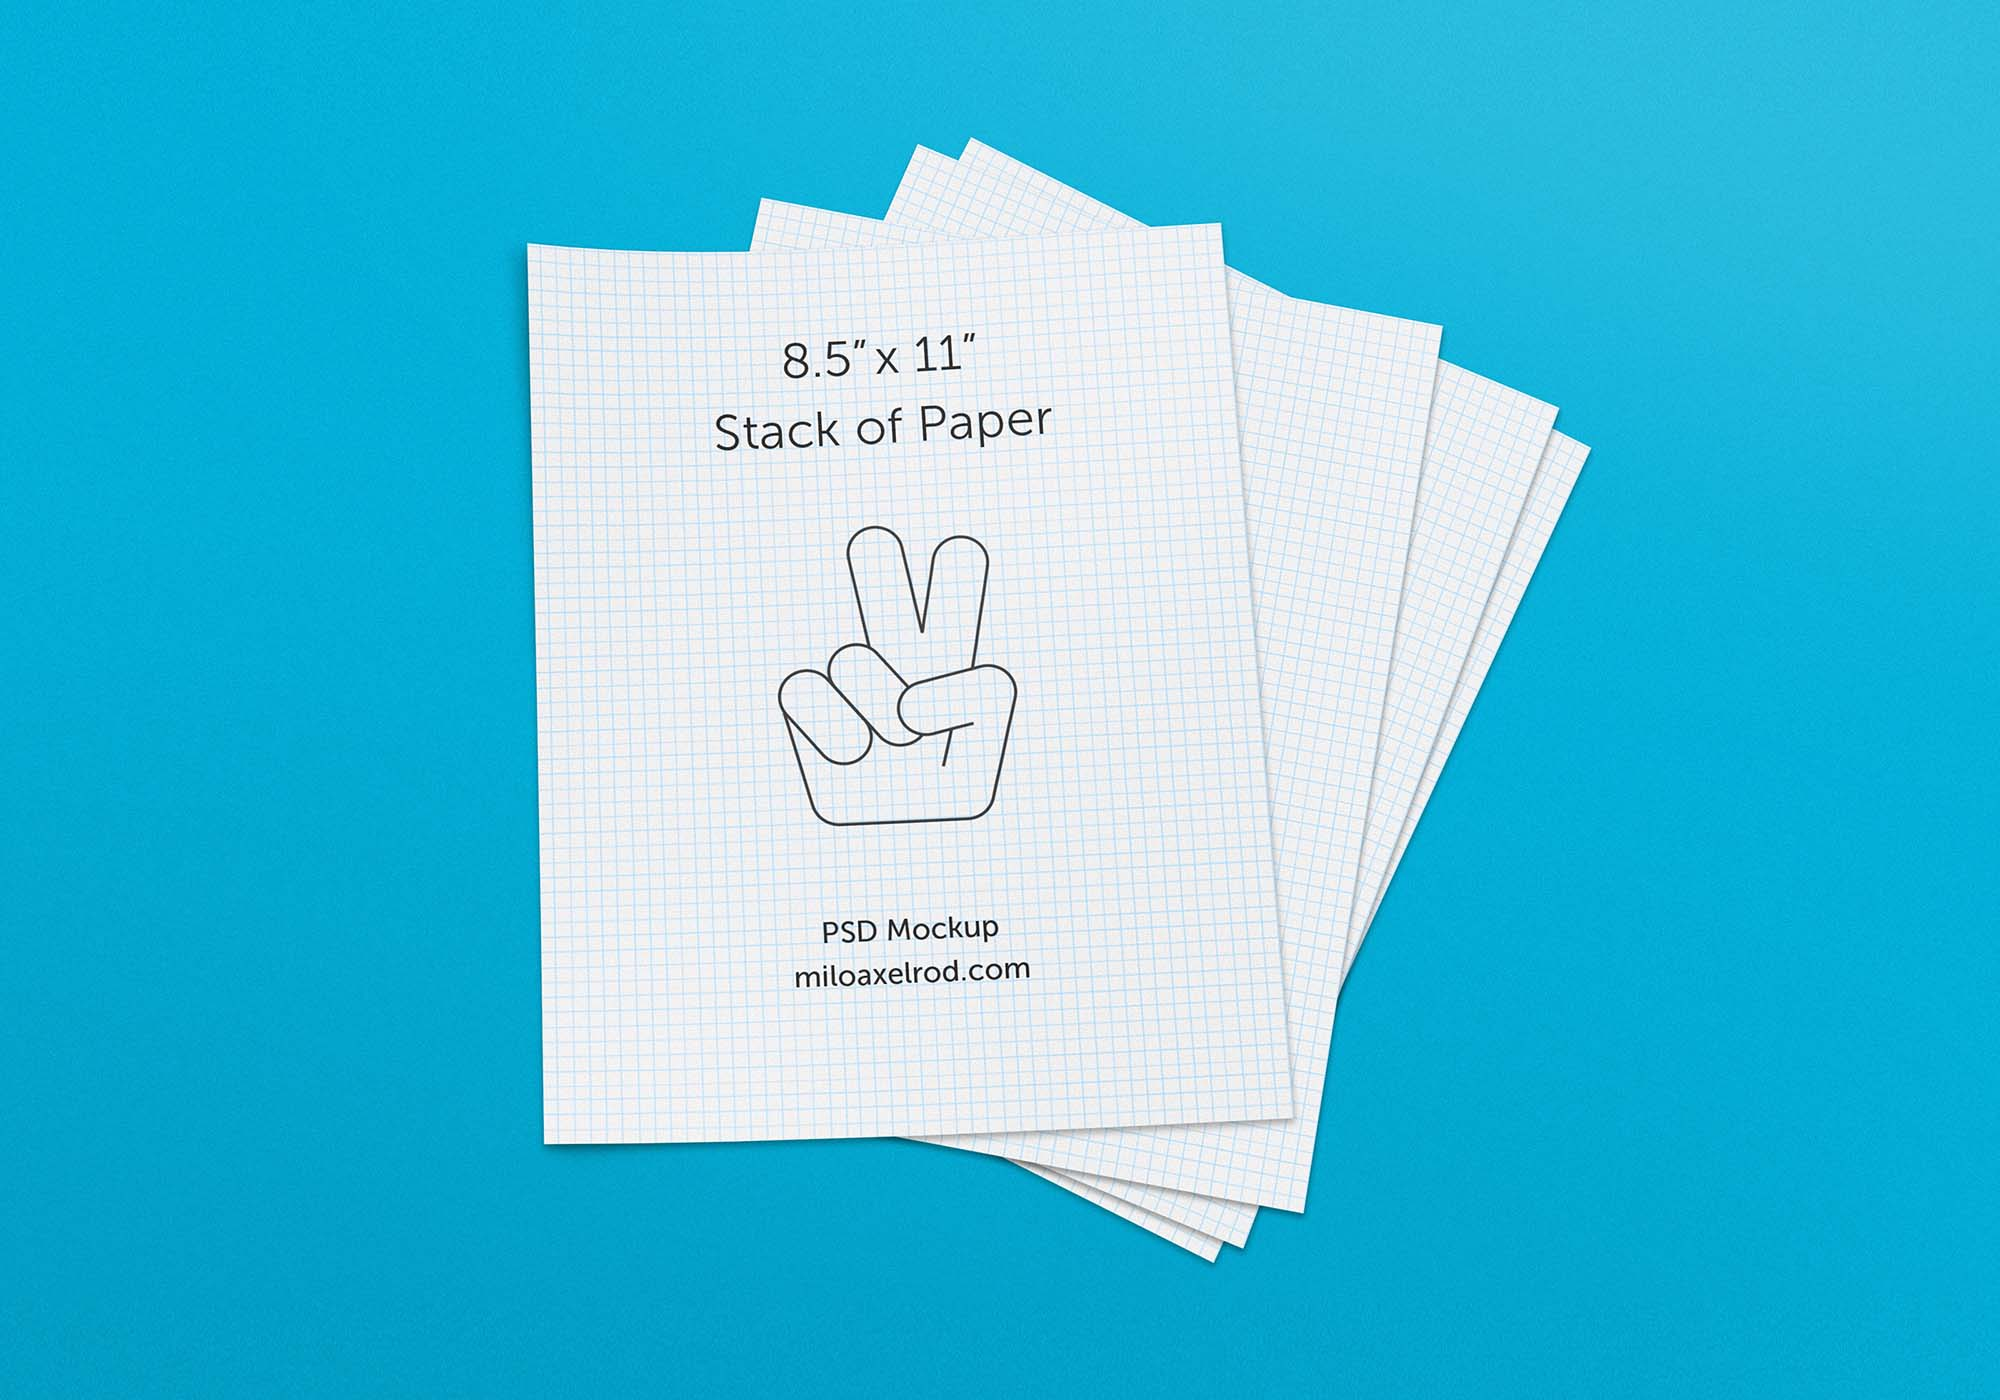 Stack of Paper Mockup